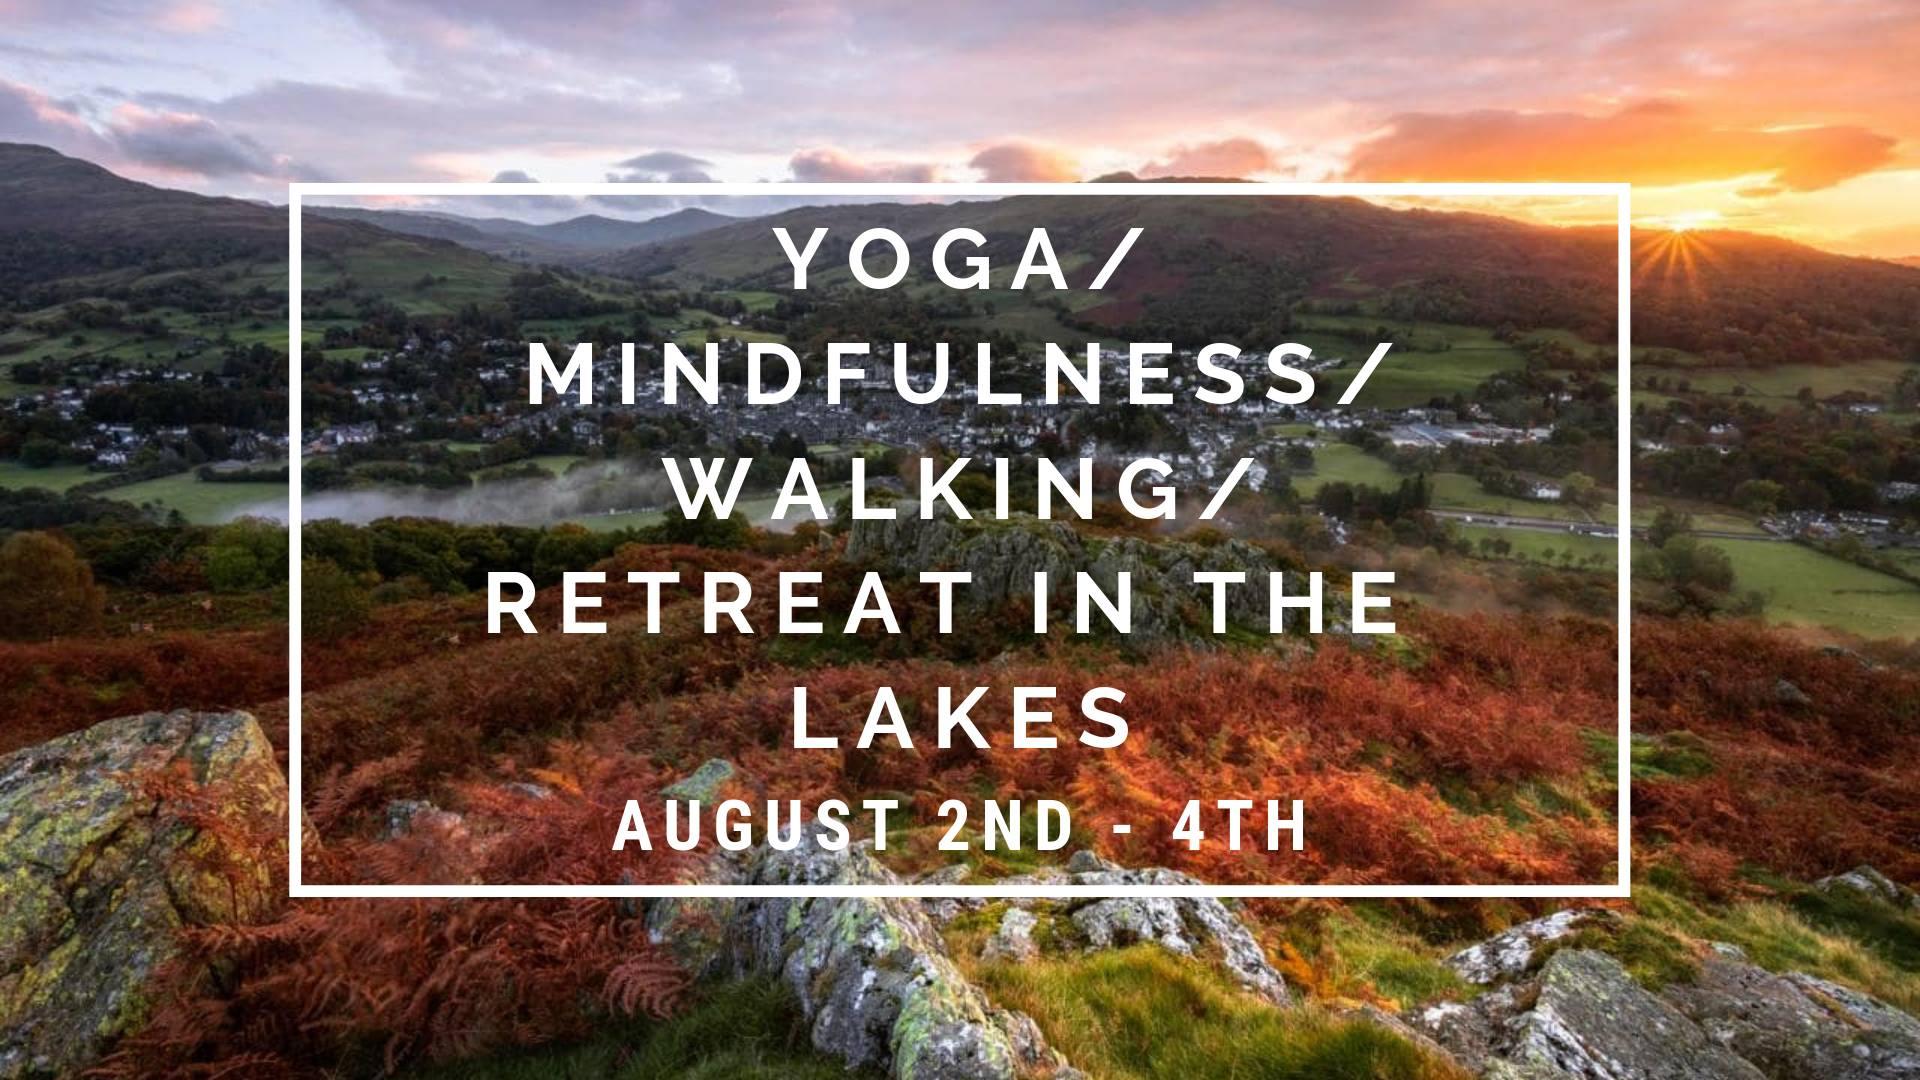 yoga retreat, mindfulness, walking, the lake district